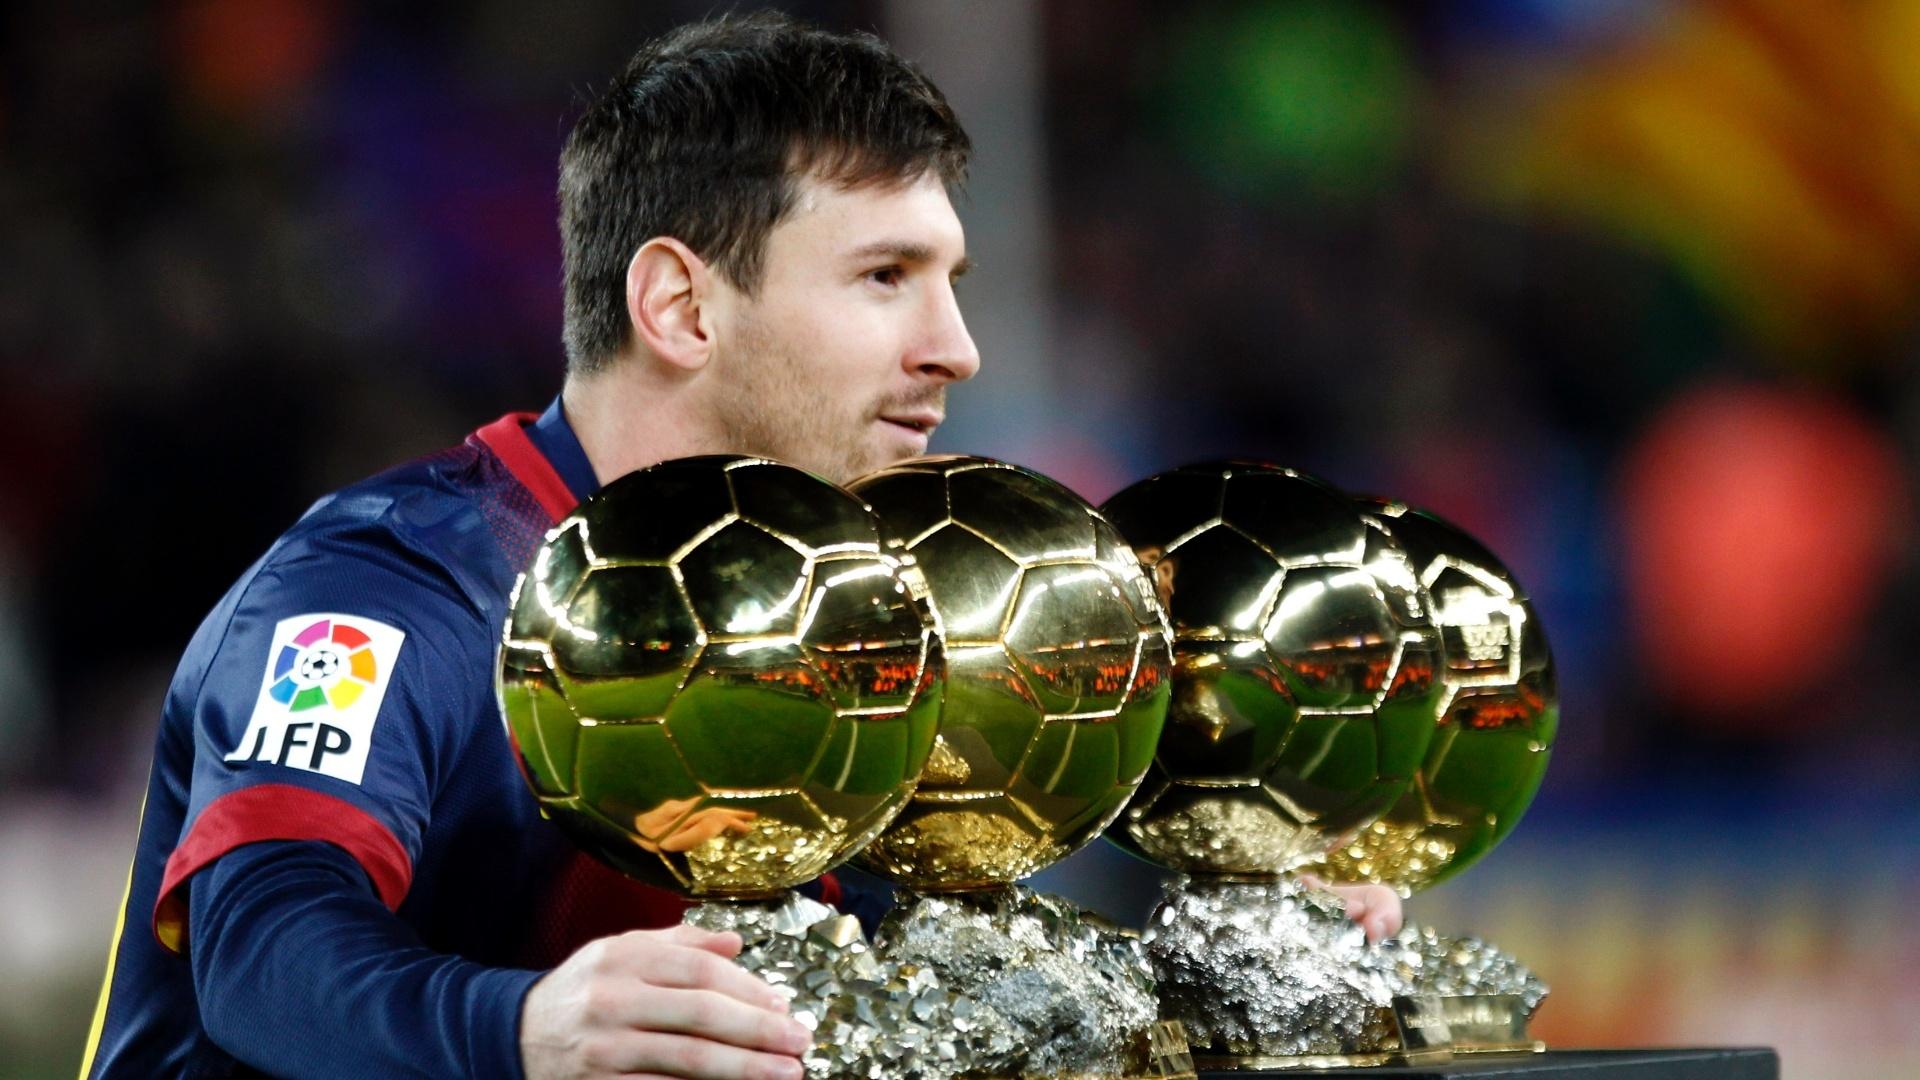 Messi: in Brasile per vincere, troppi 28 anni senza vincere i Mondiali